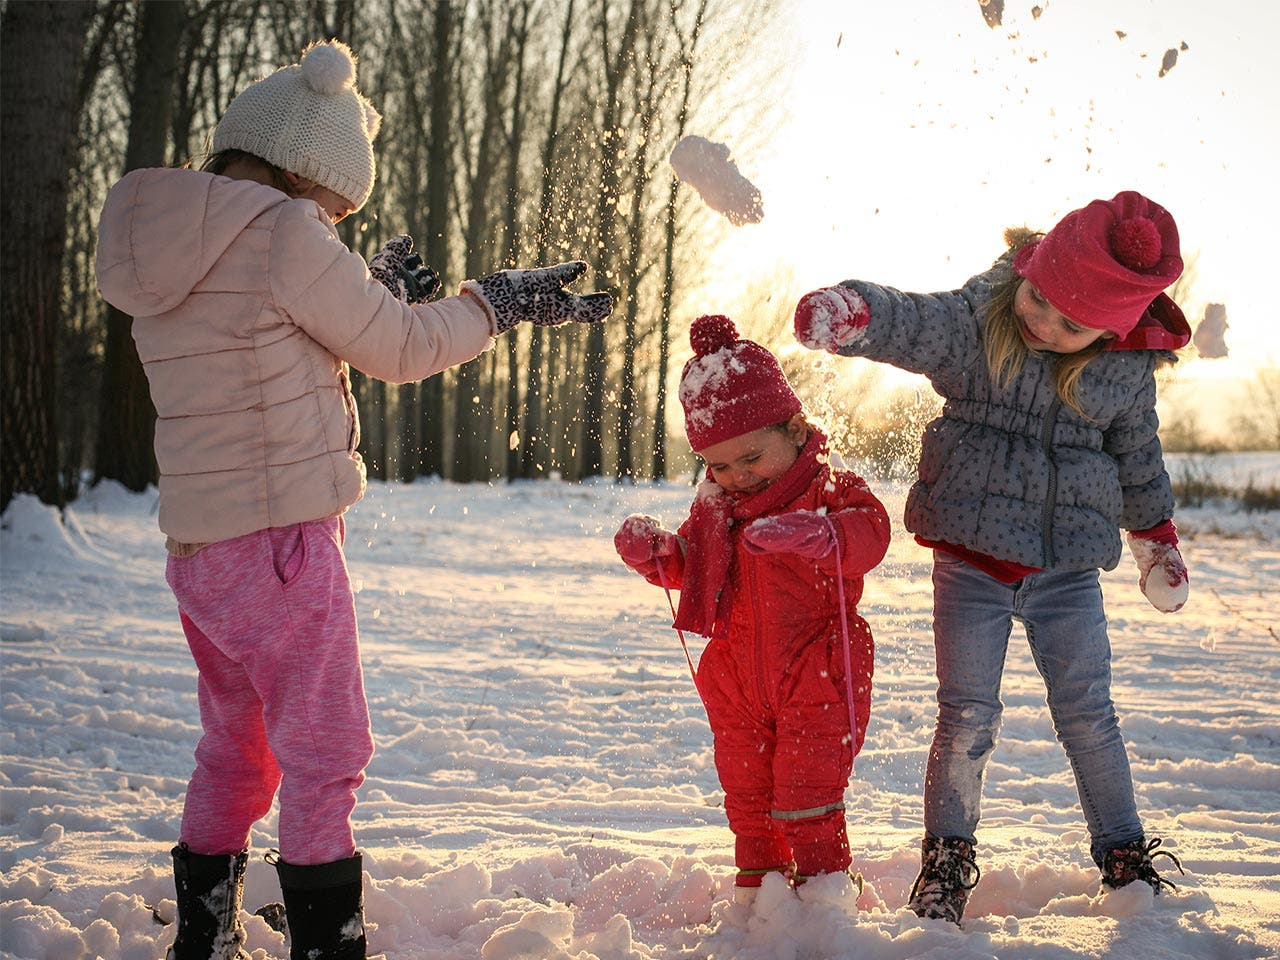 Winter apparel   Liderina/Shutterstock.com